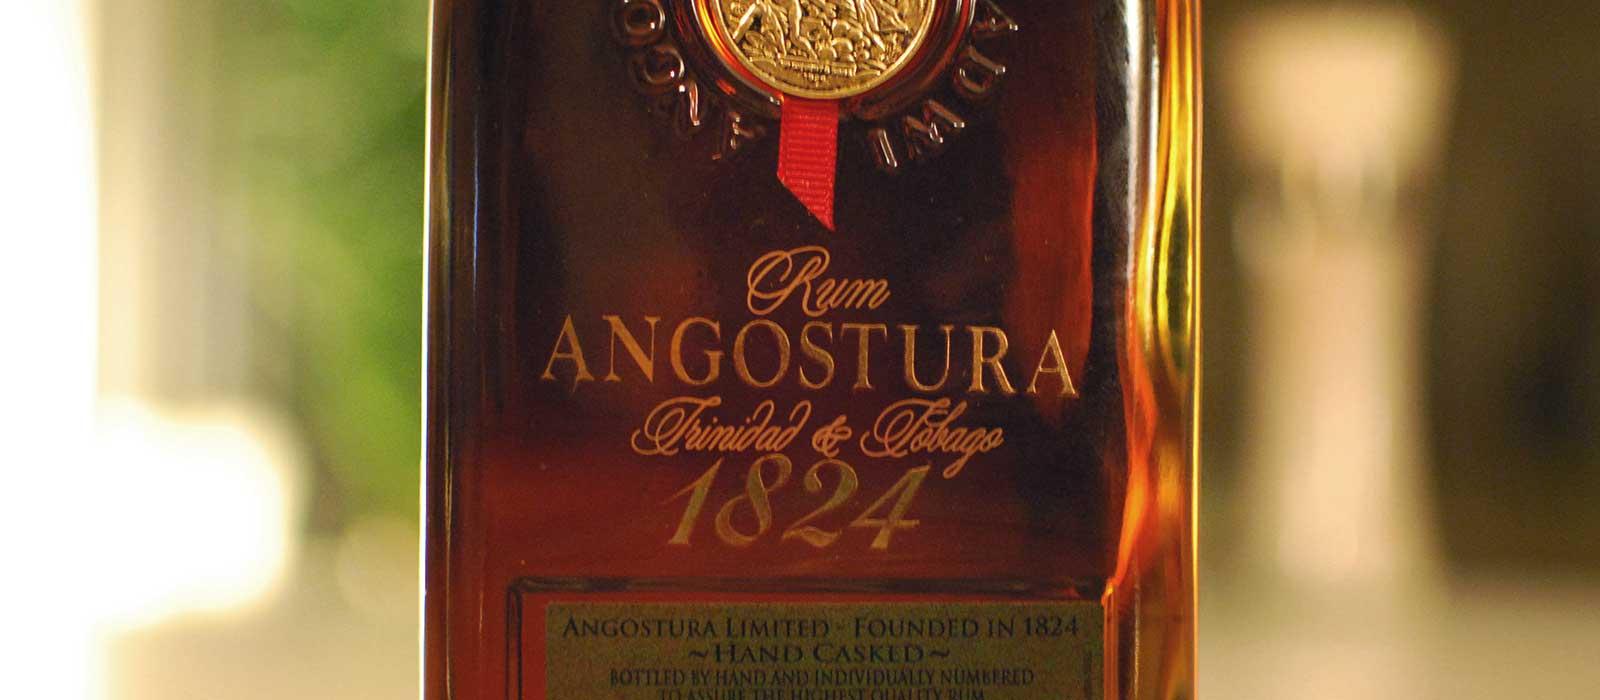 Tionde plats 2015:  Angostura 1824